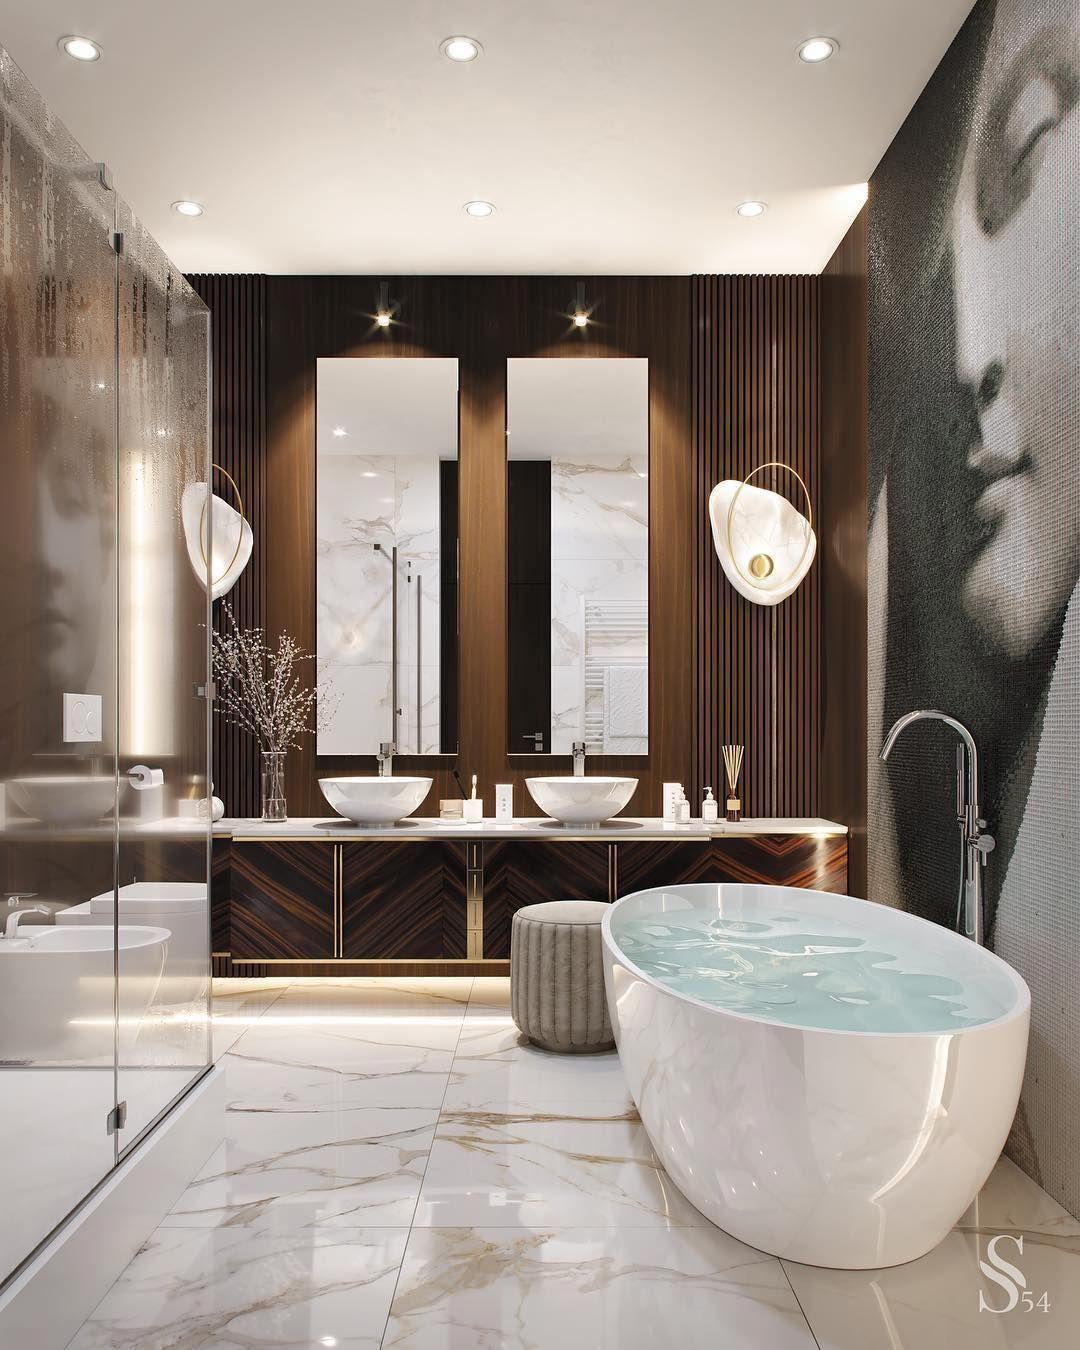 Home Decoration Karne Ka Tarika With Images Bathroom Design Luxury